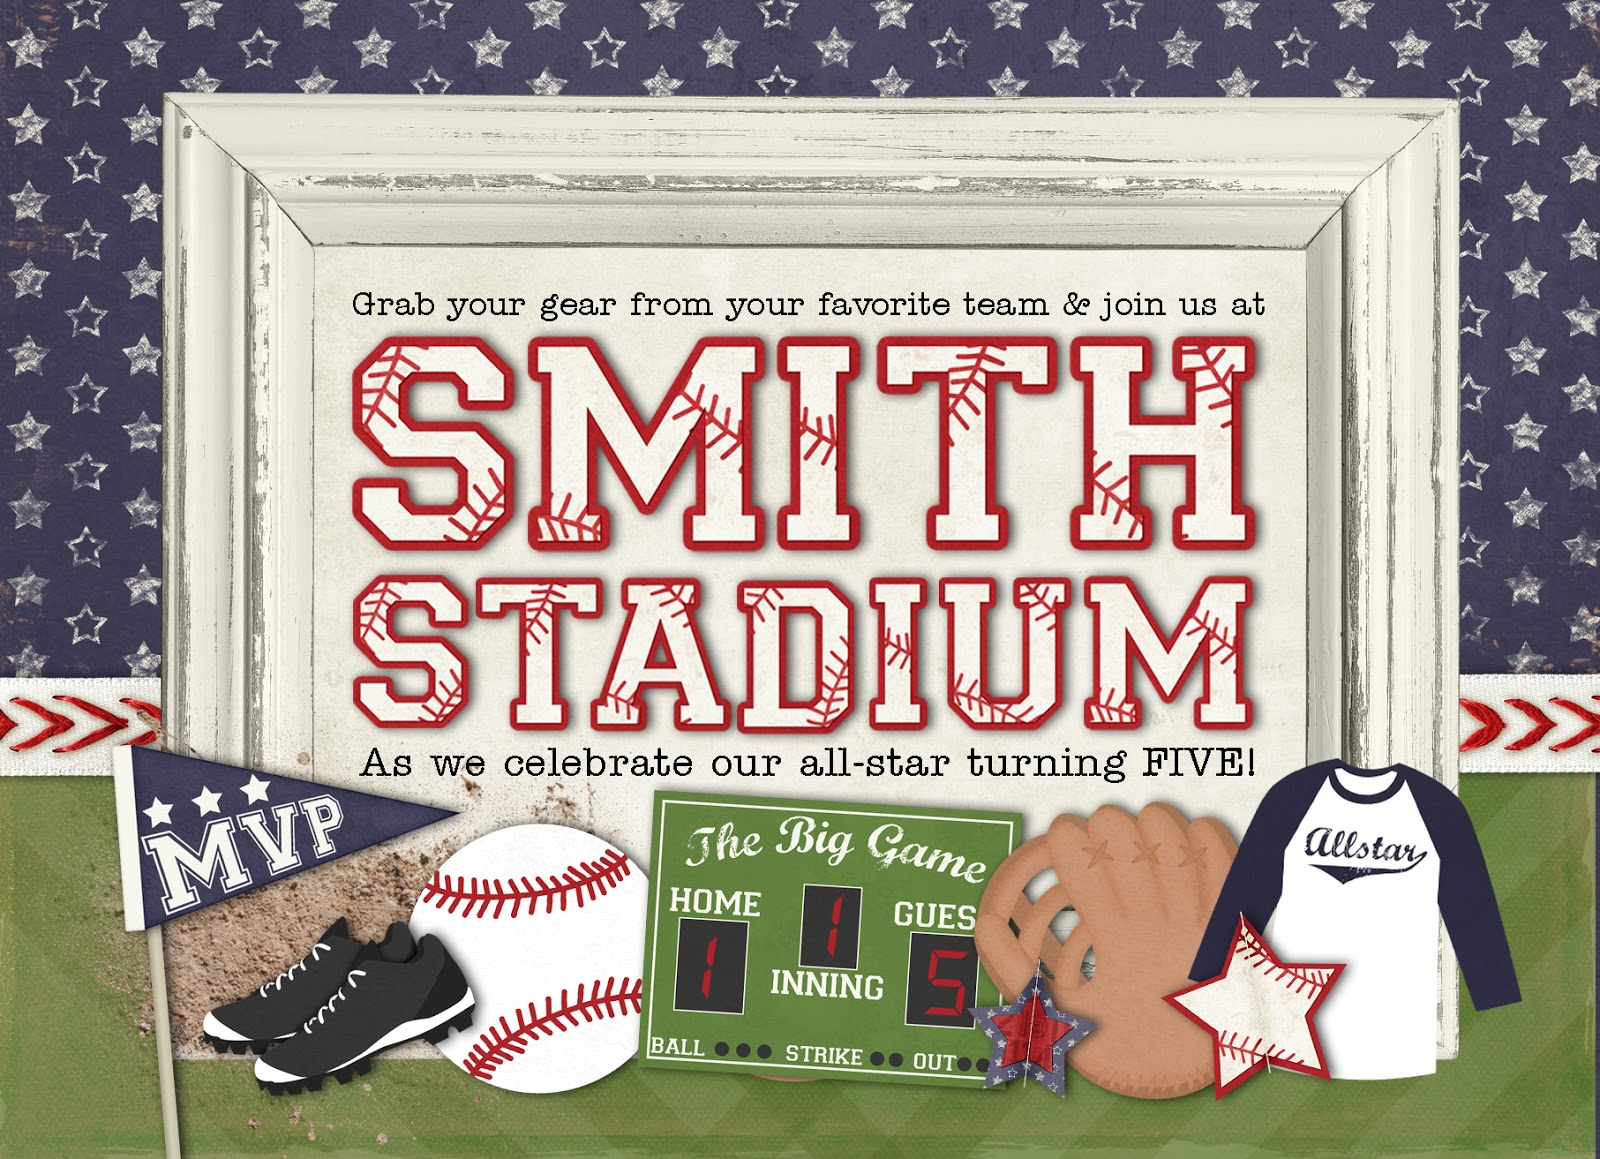 , Smith Stadium